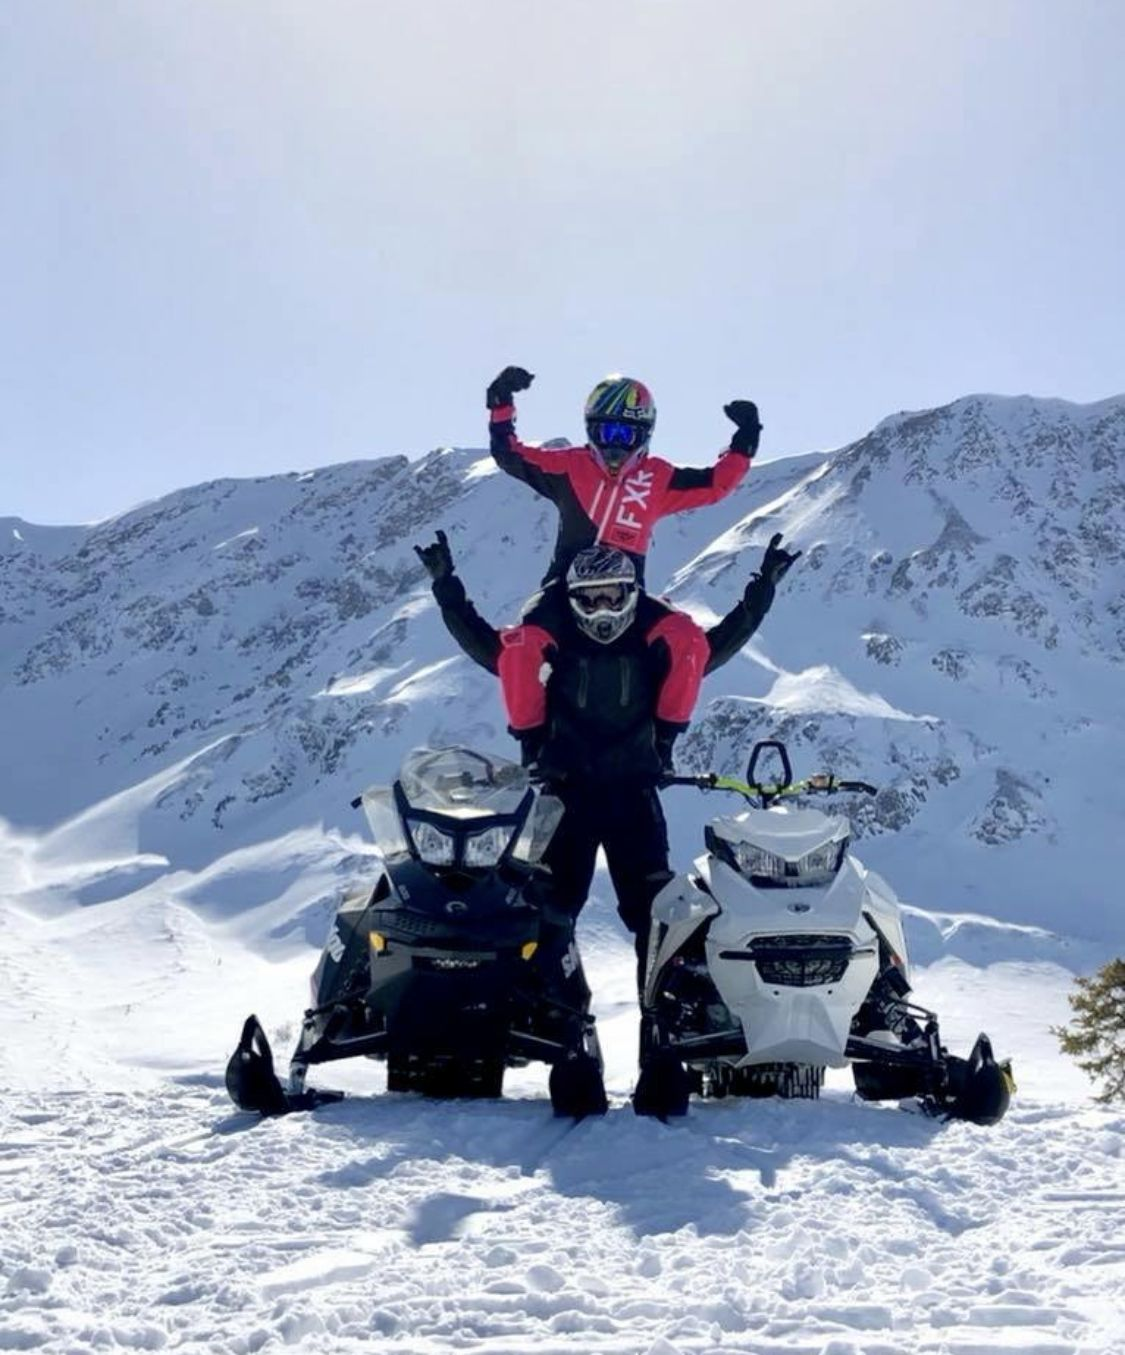 Sled photo Snowmobile couple Snowmachine couple Skidoo 600